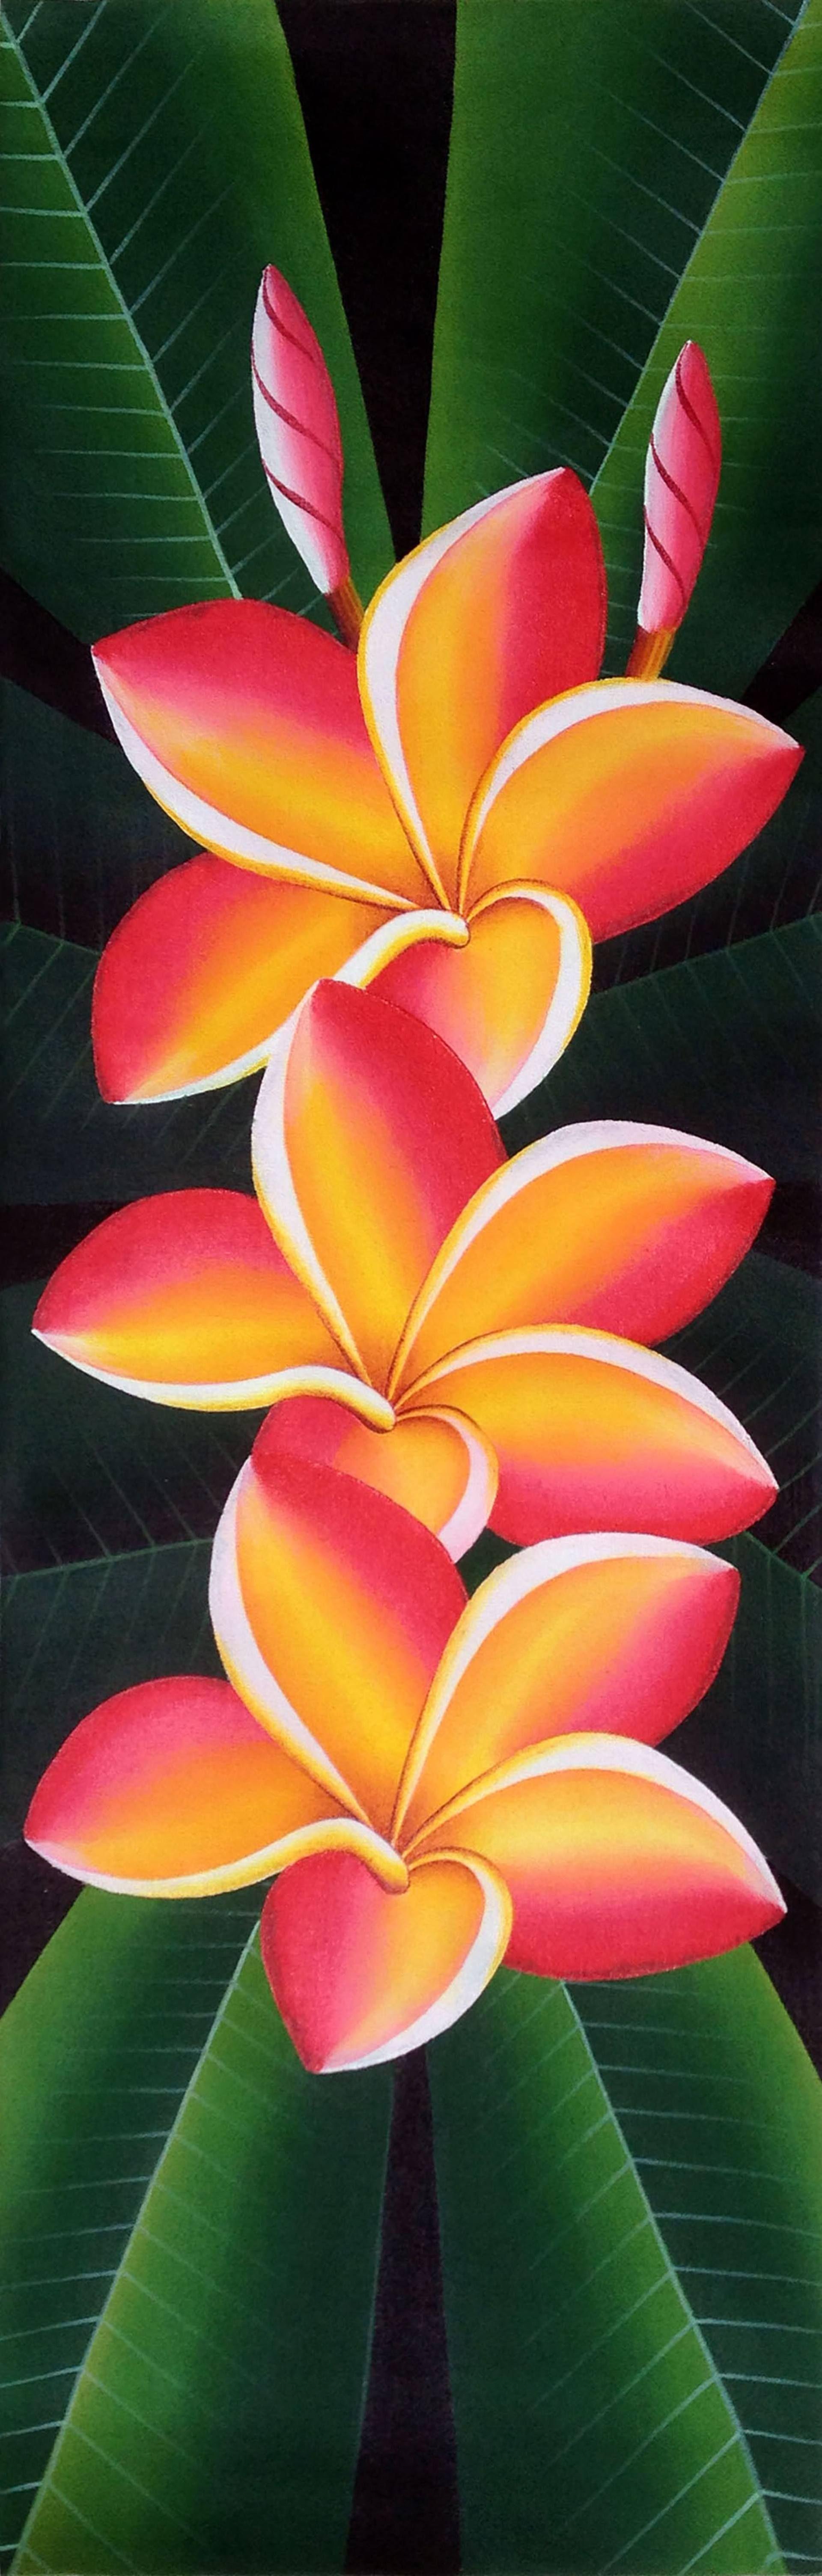 Saatchi Art Artist Natalia Anisimova Acrylic 2015 Painting Frangipani Flower Painting Indian Art Paintings Flower Drawing